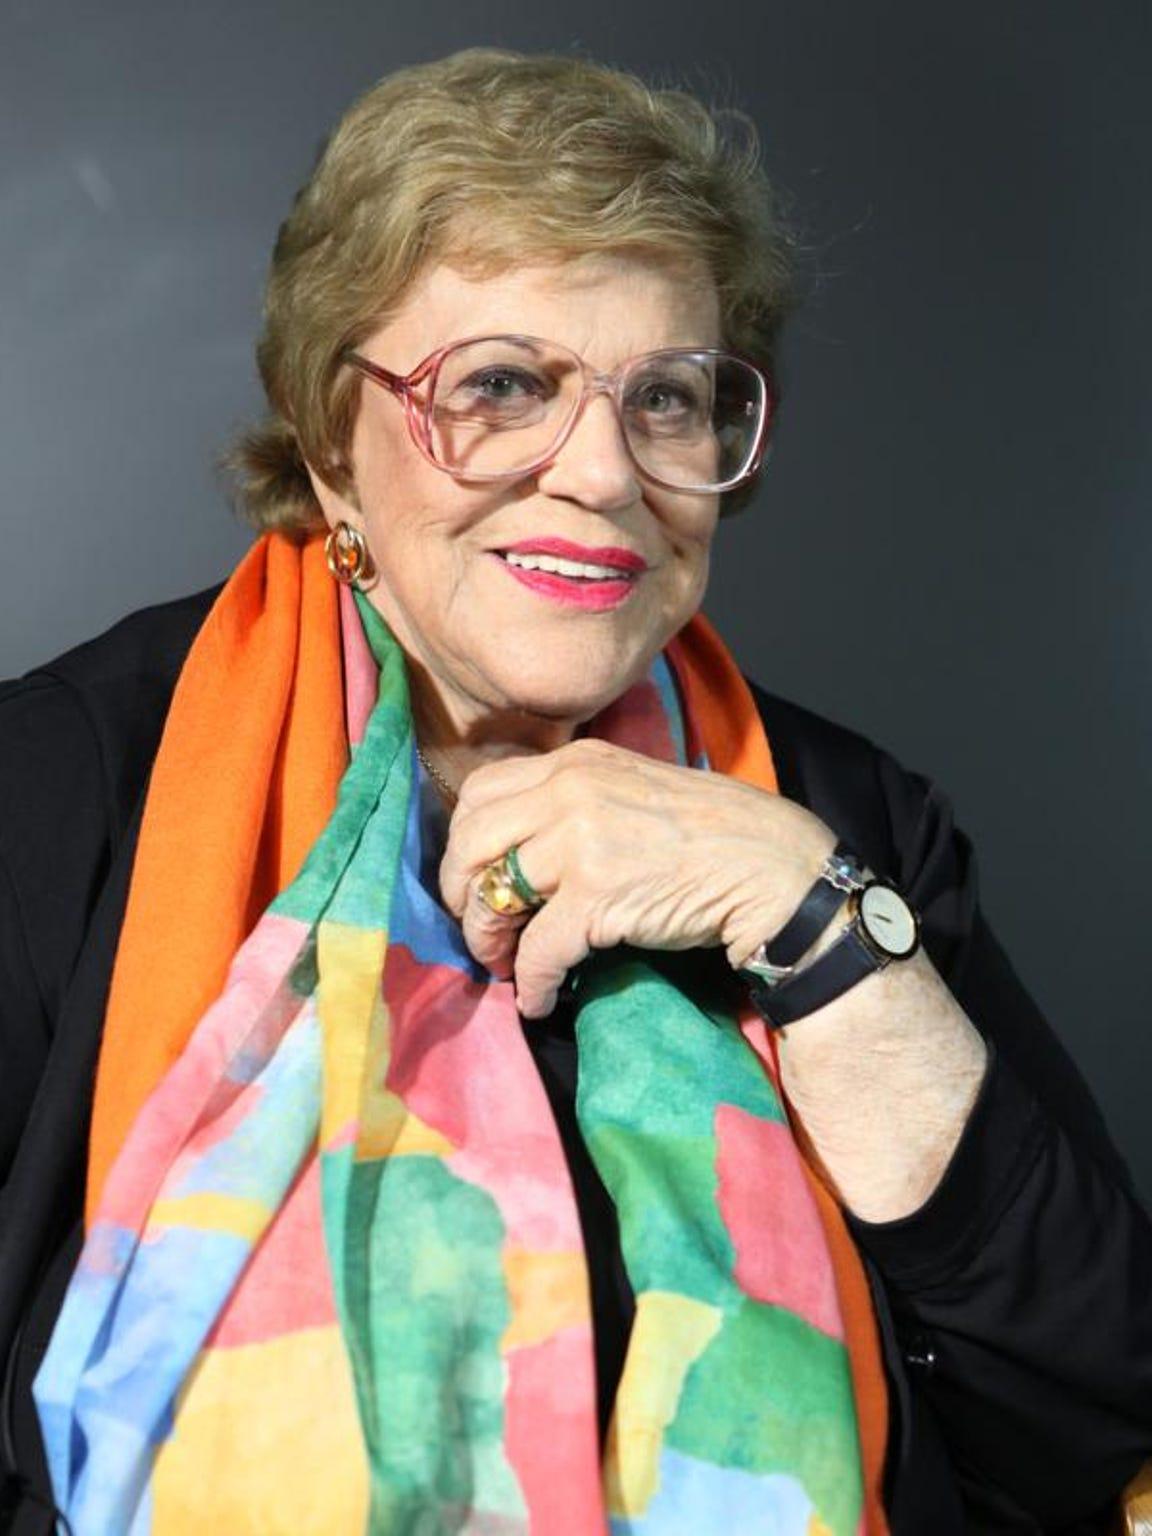 Kaye Ballard died at age 93 on Monday, Jan. 21, in Rancho Mirage.